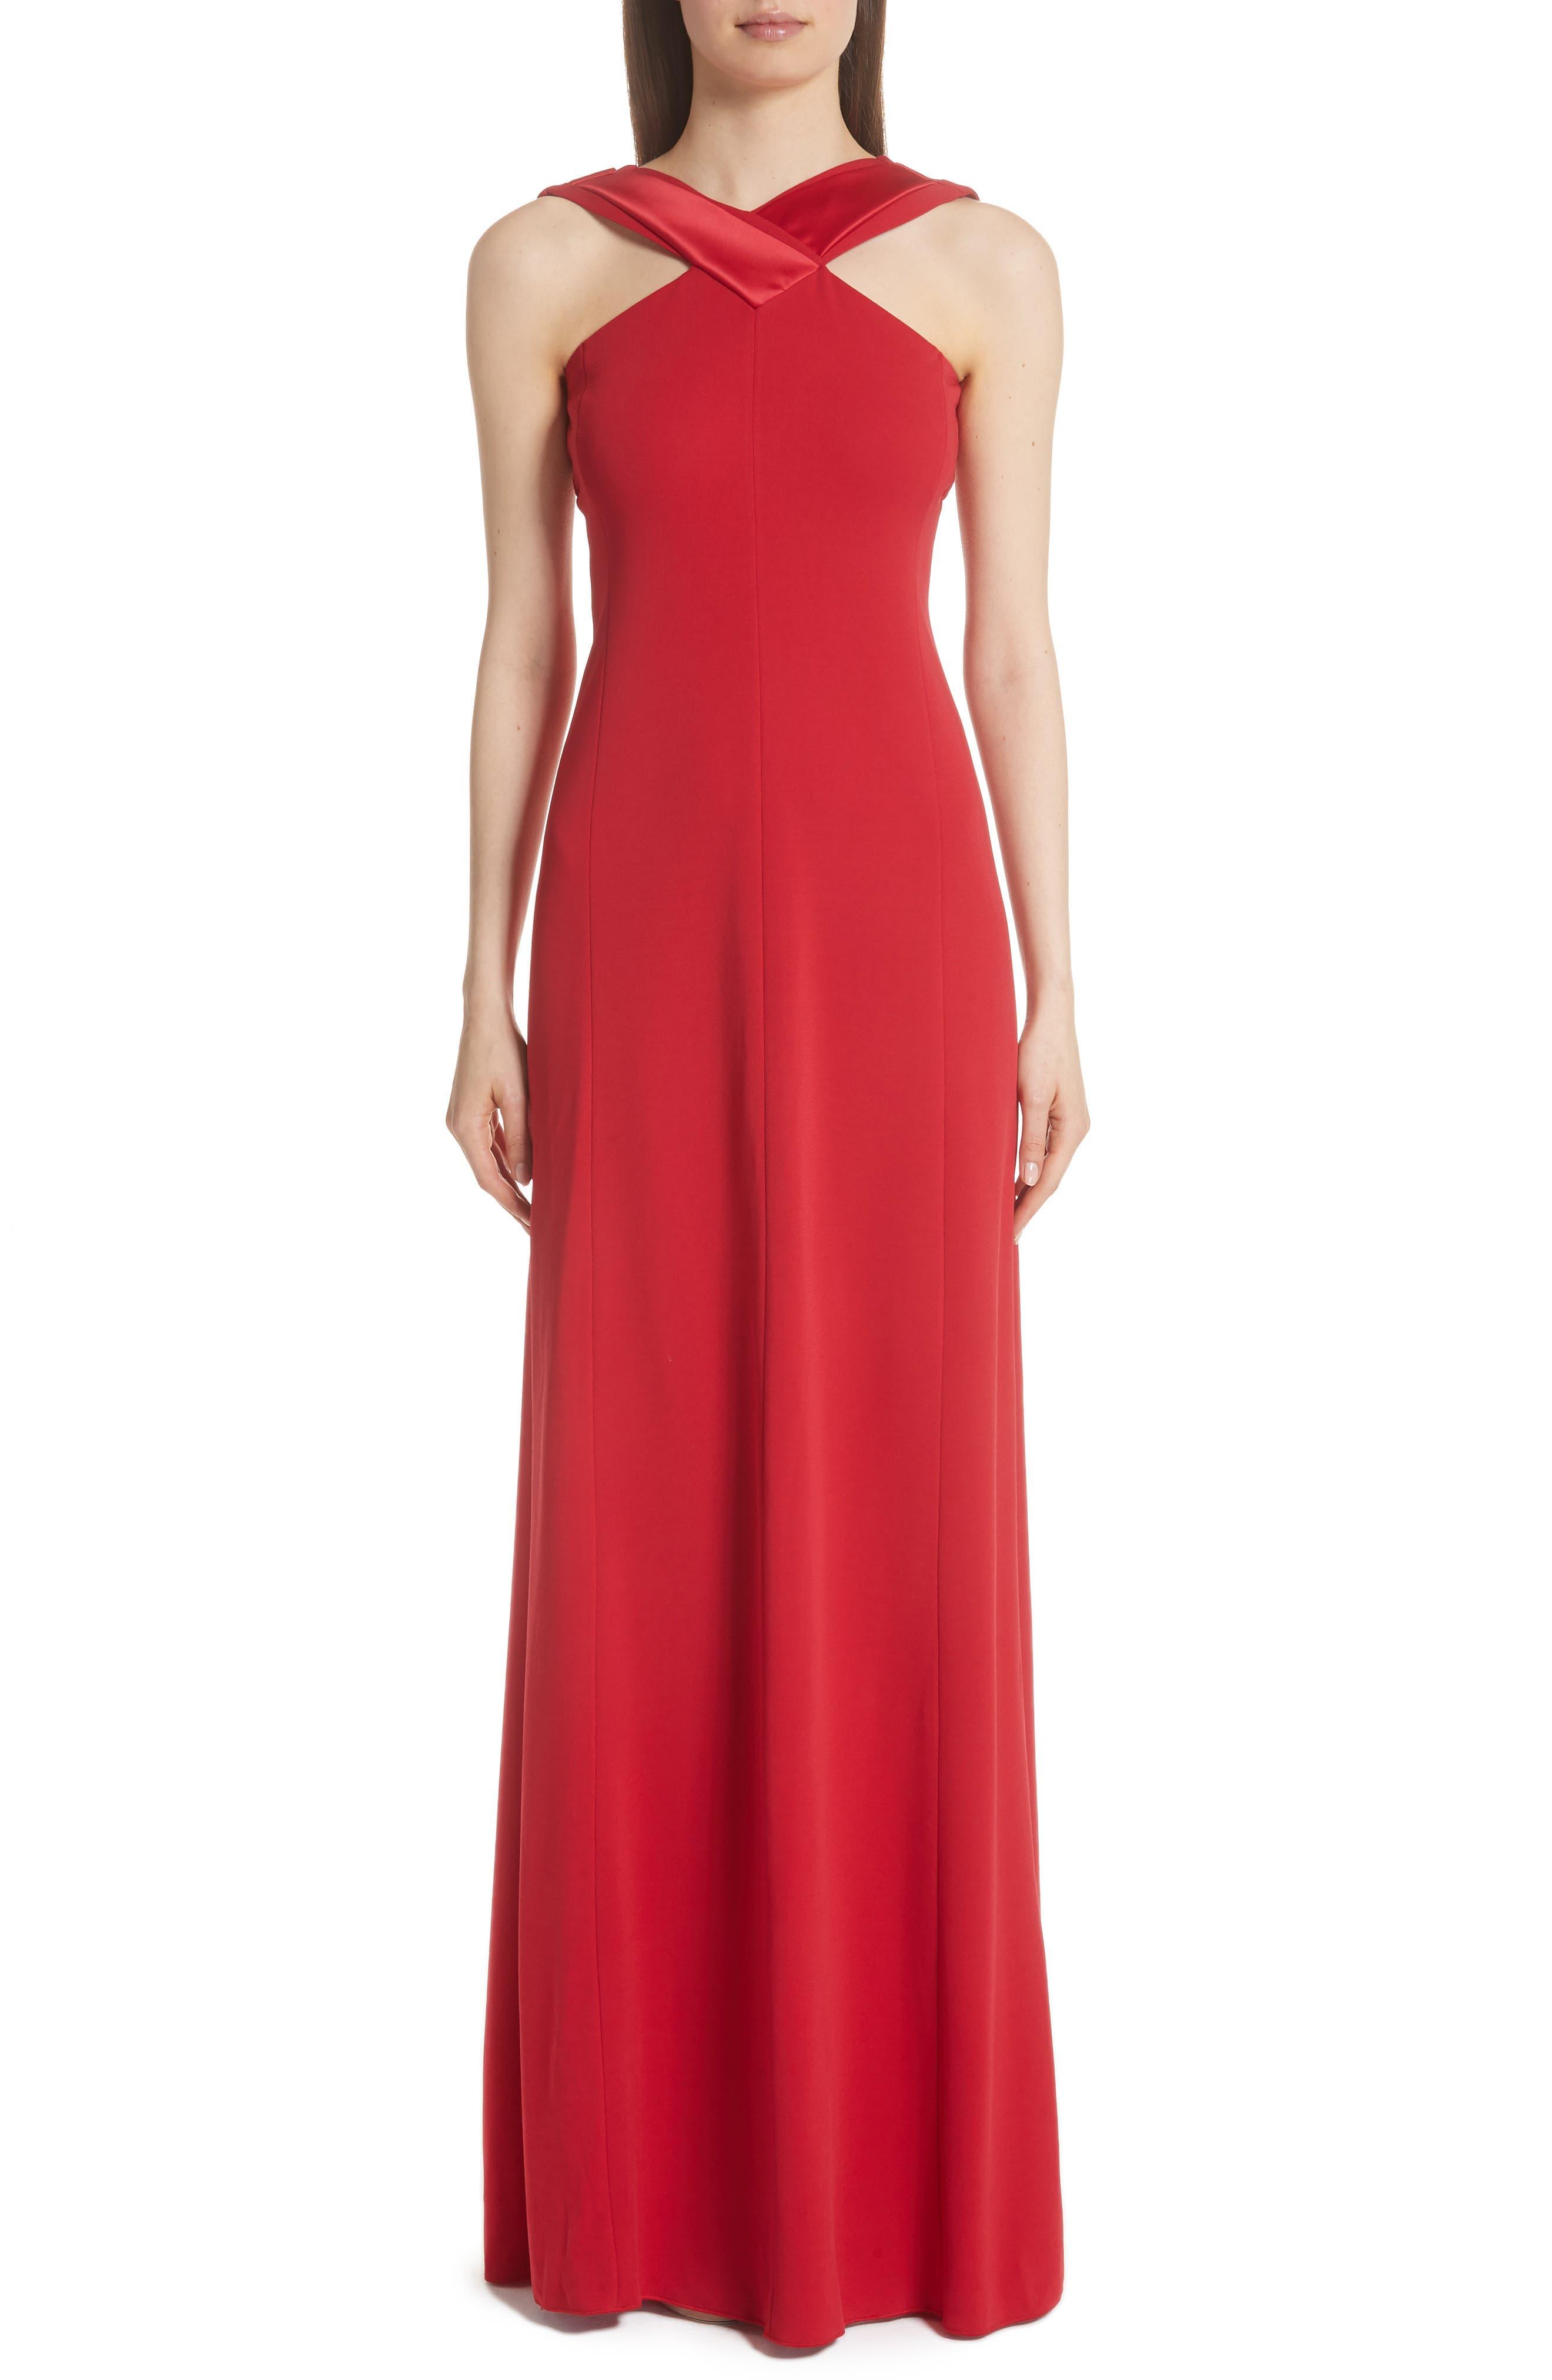 Emporio Armani Satin Neck Gown, US / 48 IT - Red